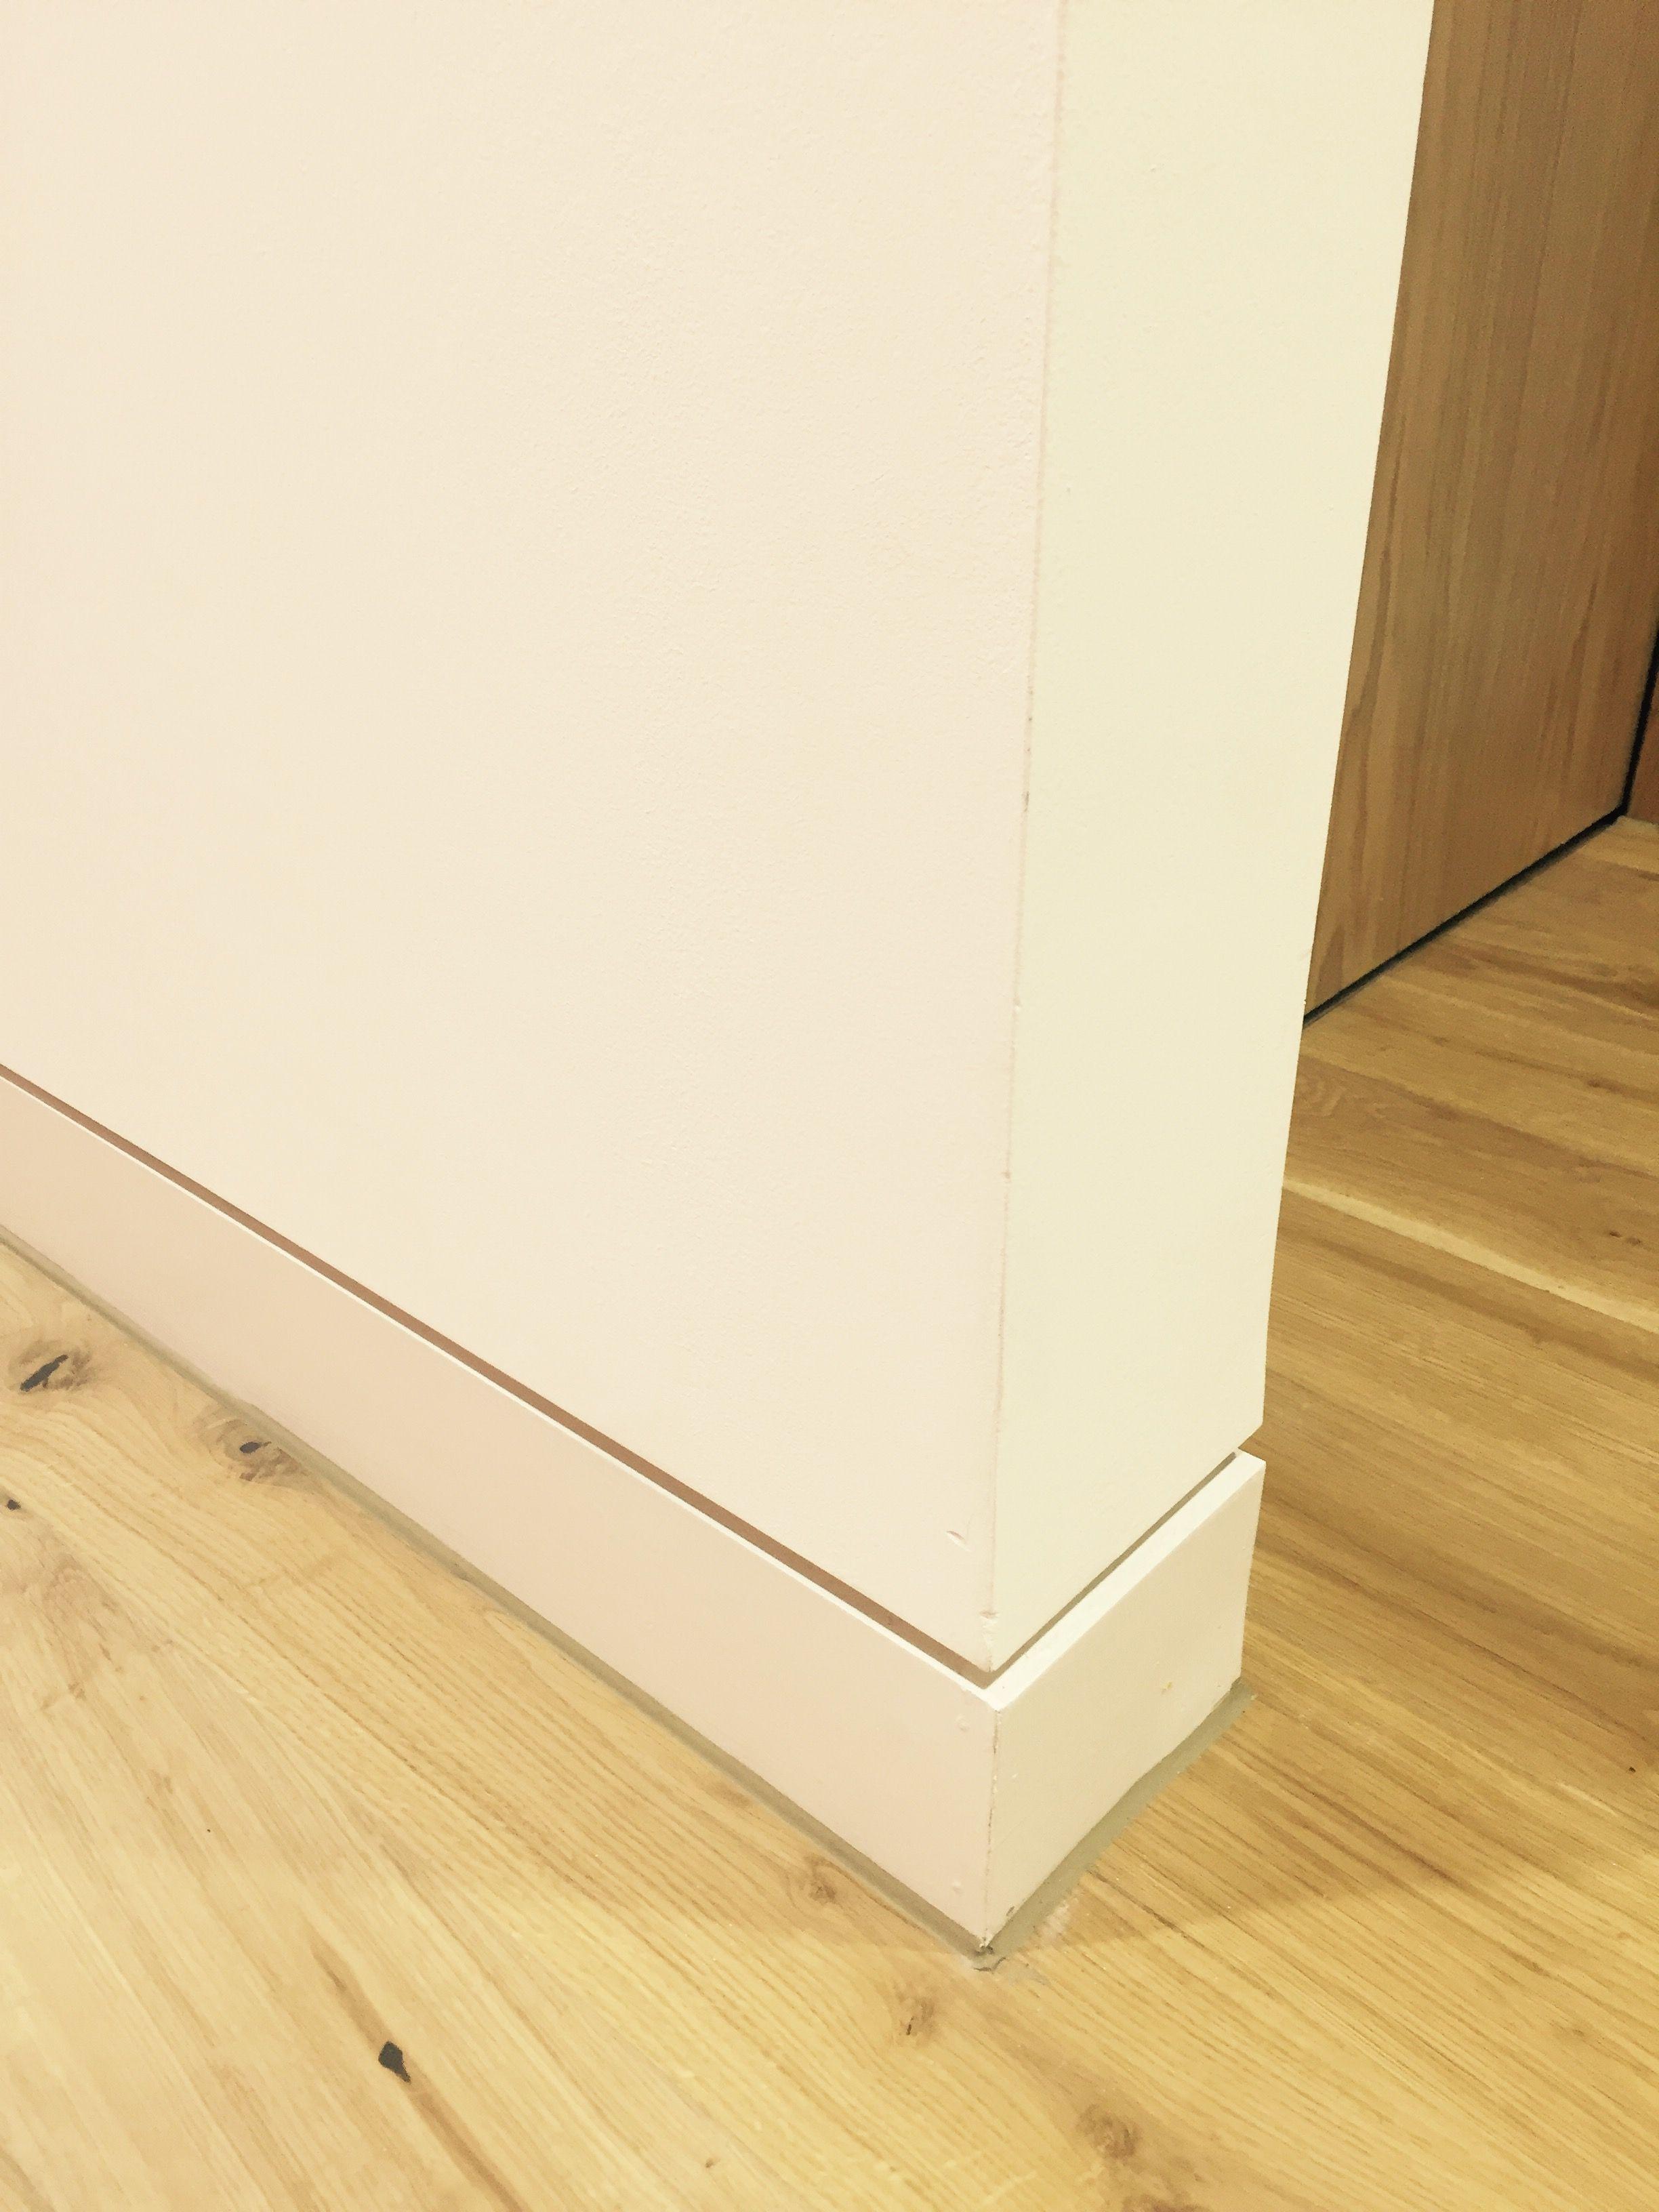 White Shadow Gap Skirting Detail Floor Trim Interior Skirting